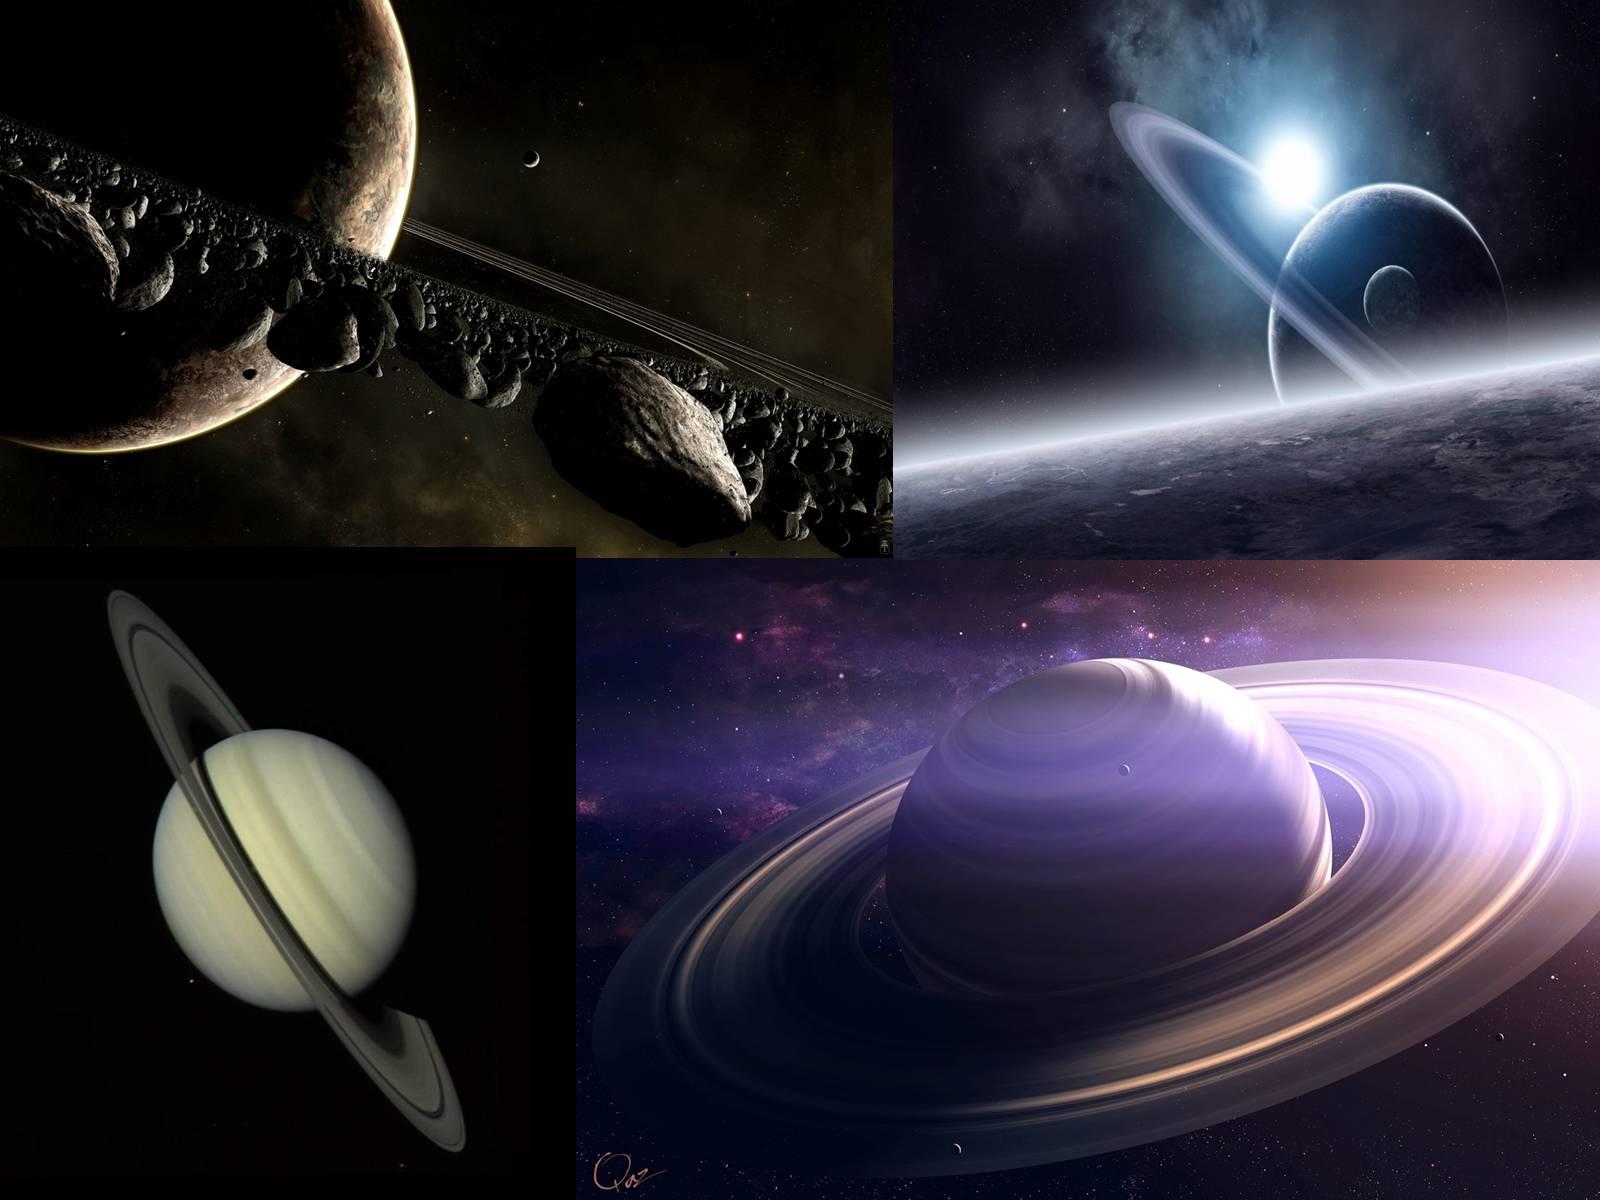 planet saturn information - HD1600×1200